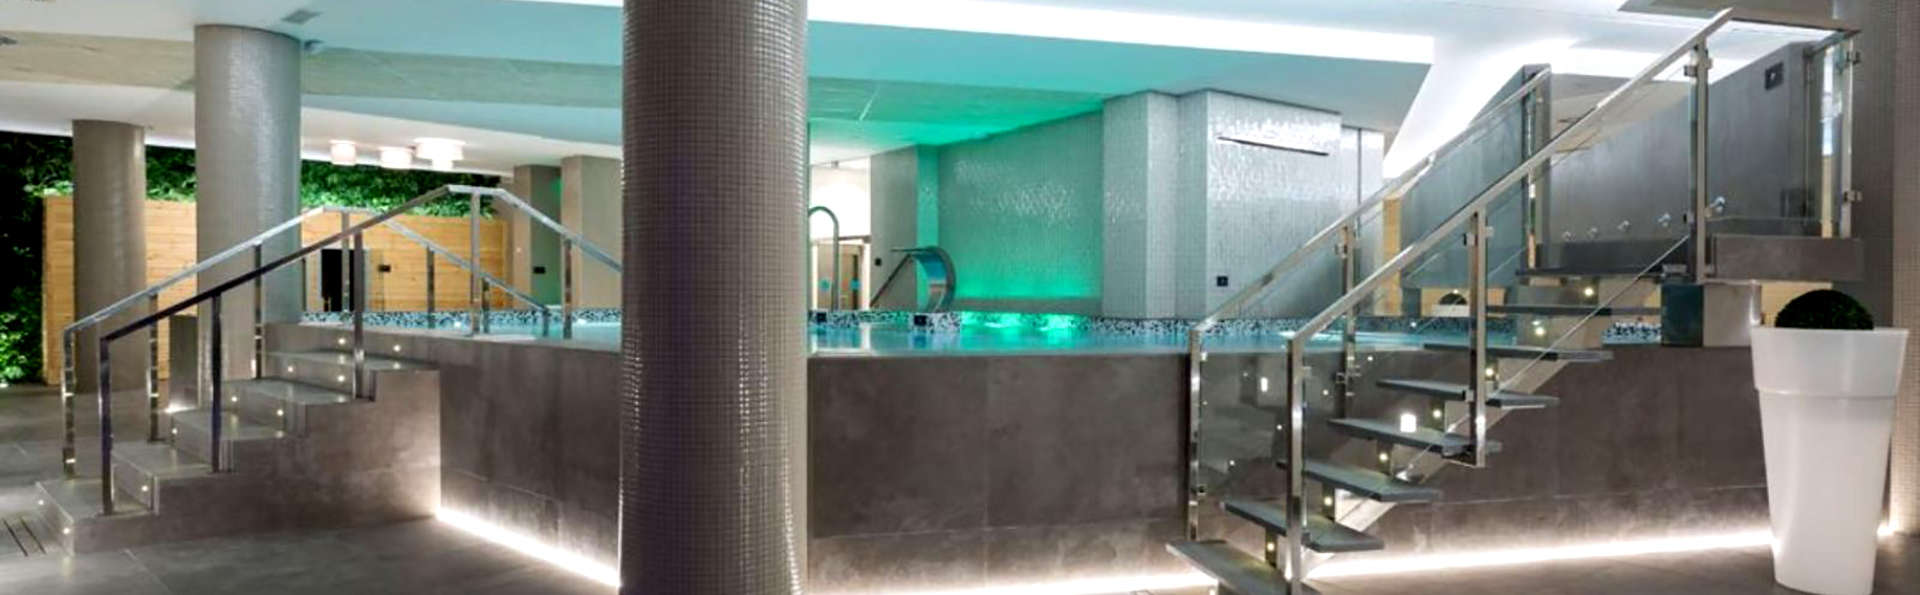 Spa Sercotel Hotel Odeón - EDIT_NEW2_SPA2.jpg